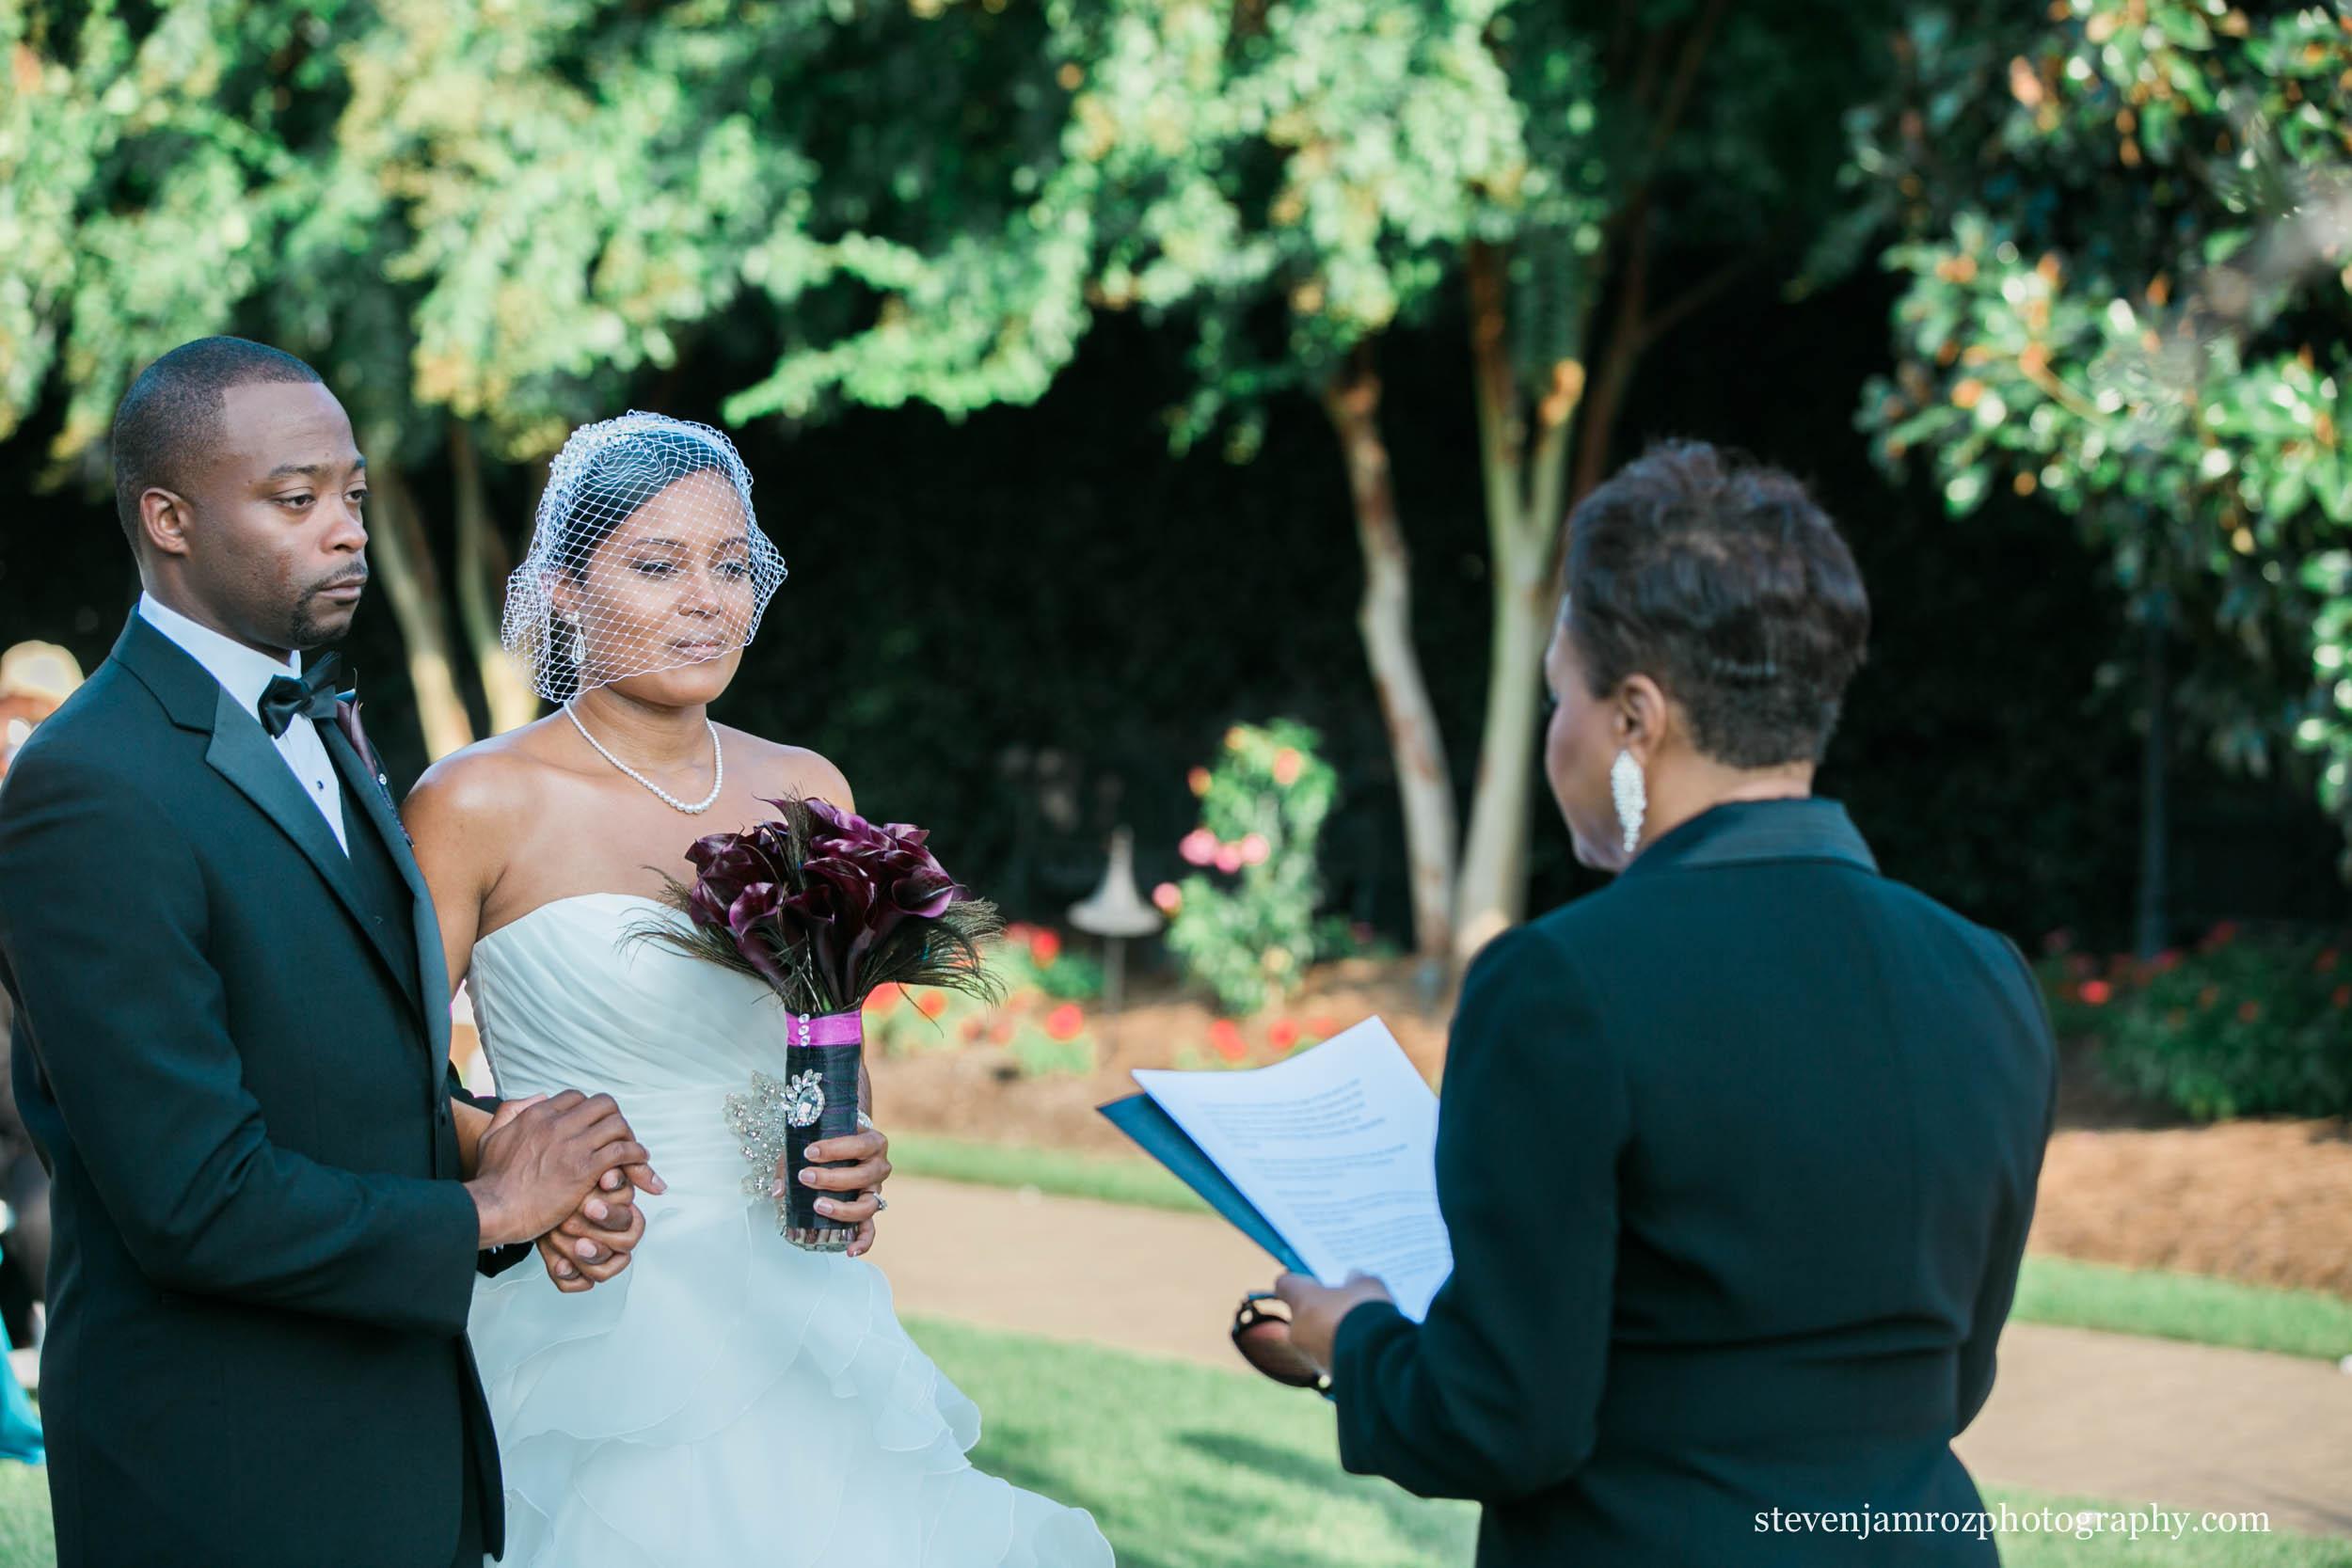 emotional-bride-hall-at-landmark-wedding-nc-steven-jamroz-photography-0142.jpg